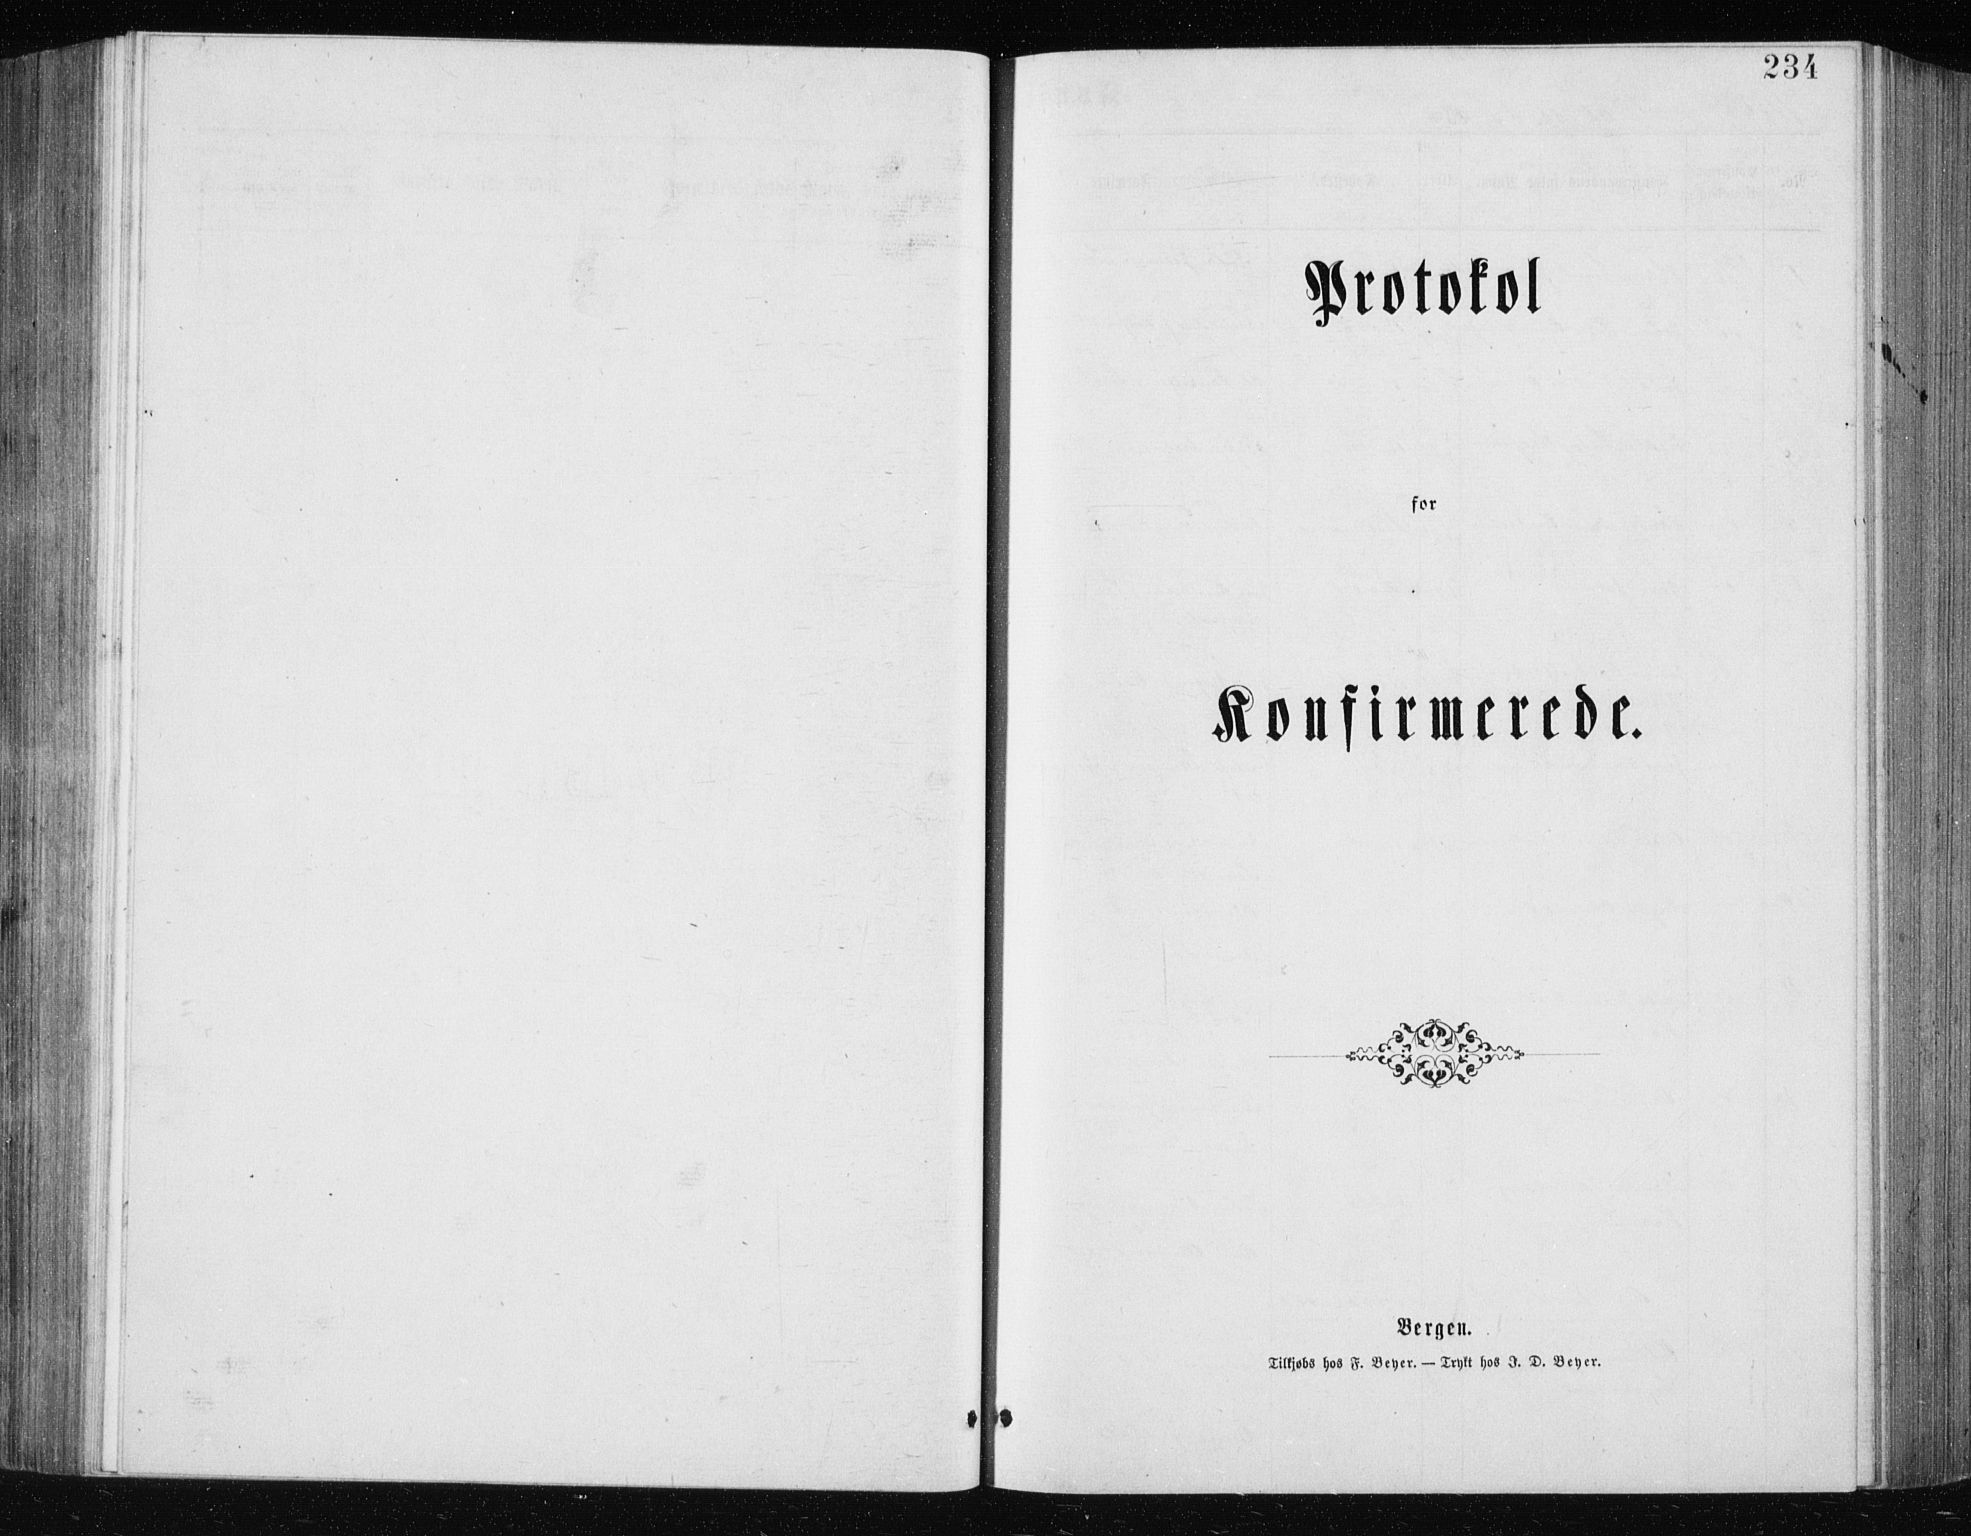 SAT, Ministerialprotokoller, klokkerbøker og fødselsregistre - Nordland, 801/L0031: Klokkerbok nr. 801C06, 1883-1887, s. 234